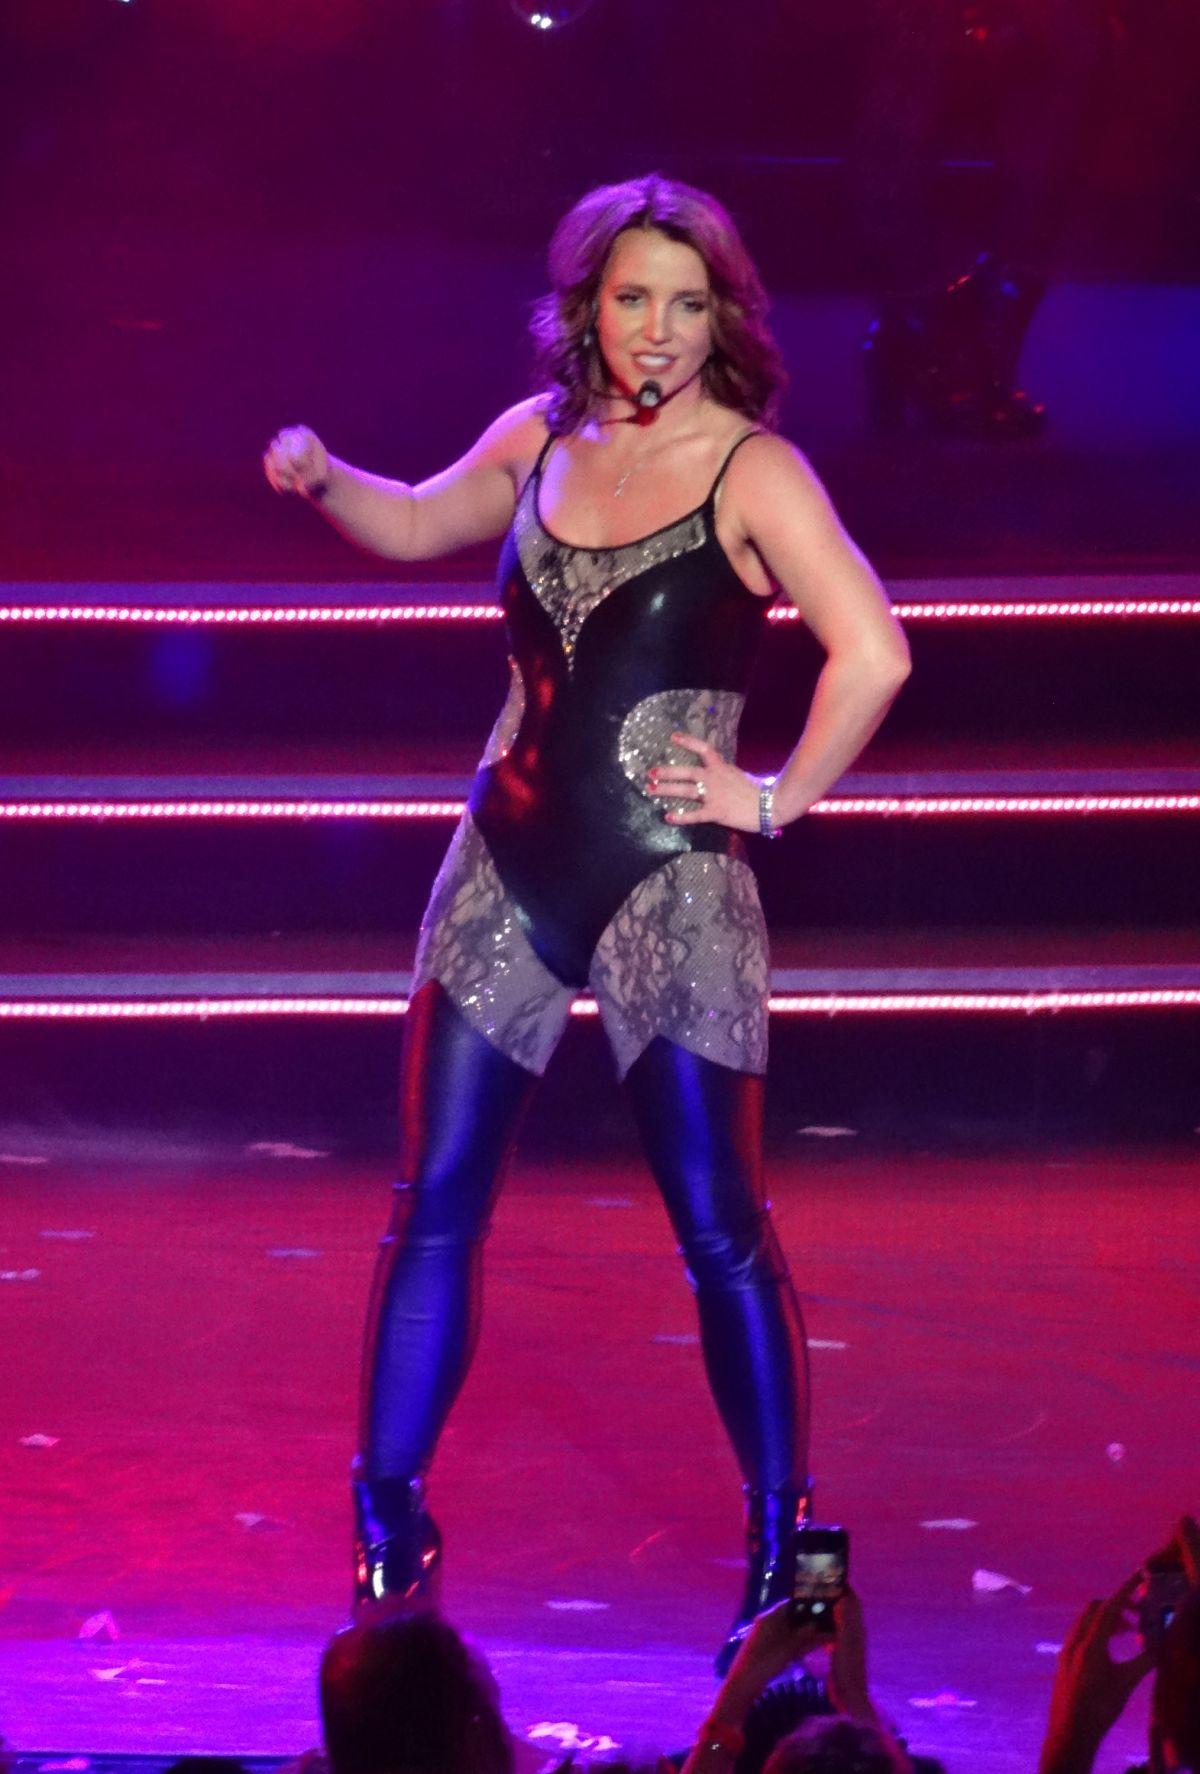 BRITNEY SPEARS Performs Live in Las Vegas - HawtCelebs ... Britney Spears Vegas